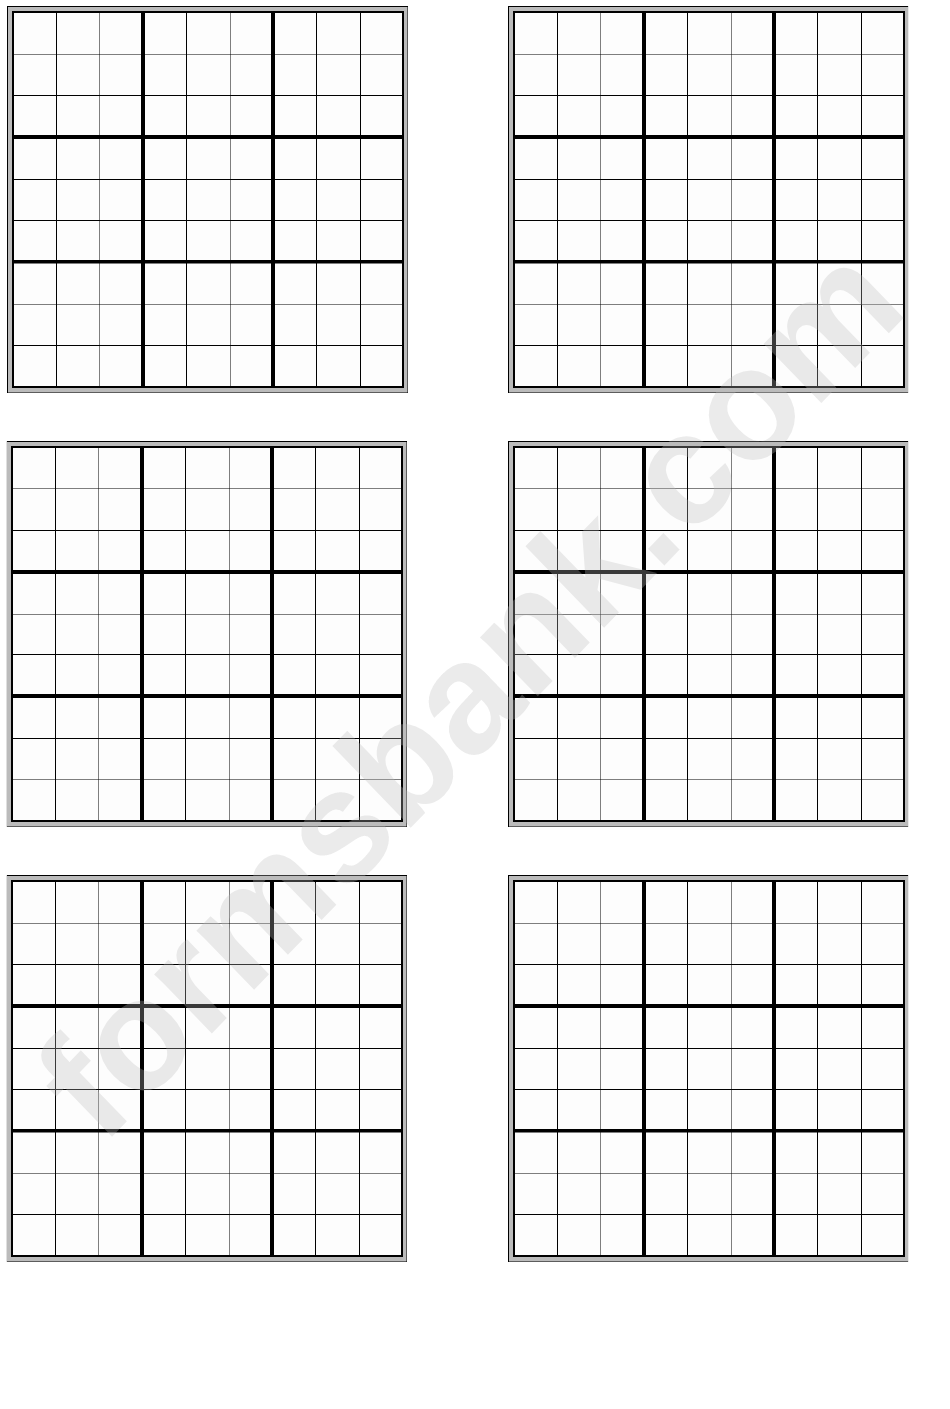 blank sudoku template